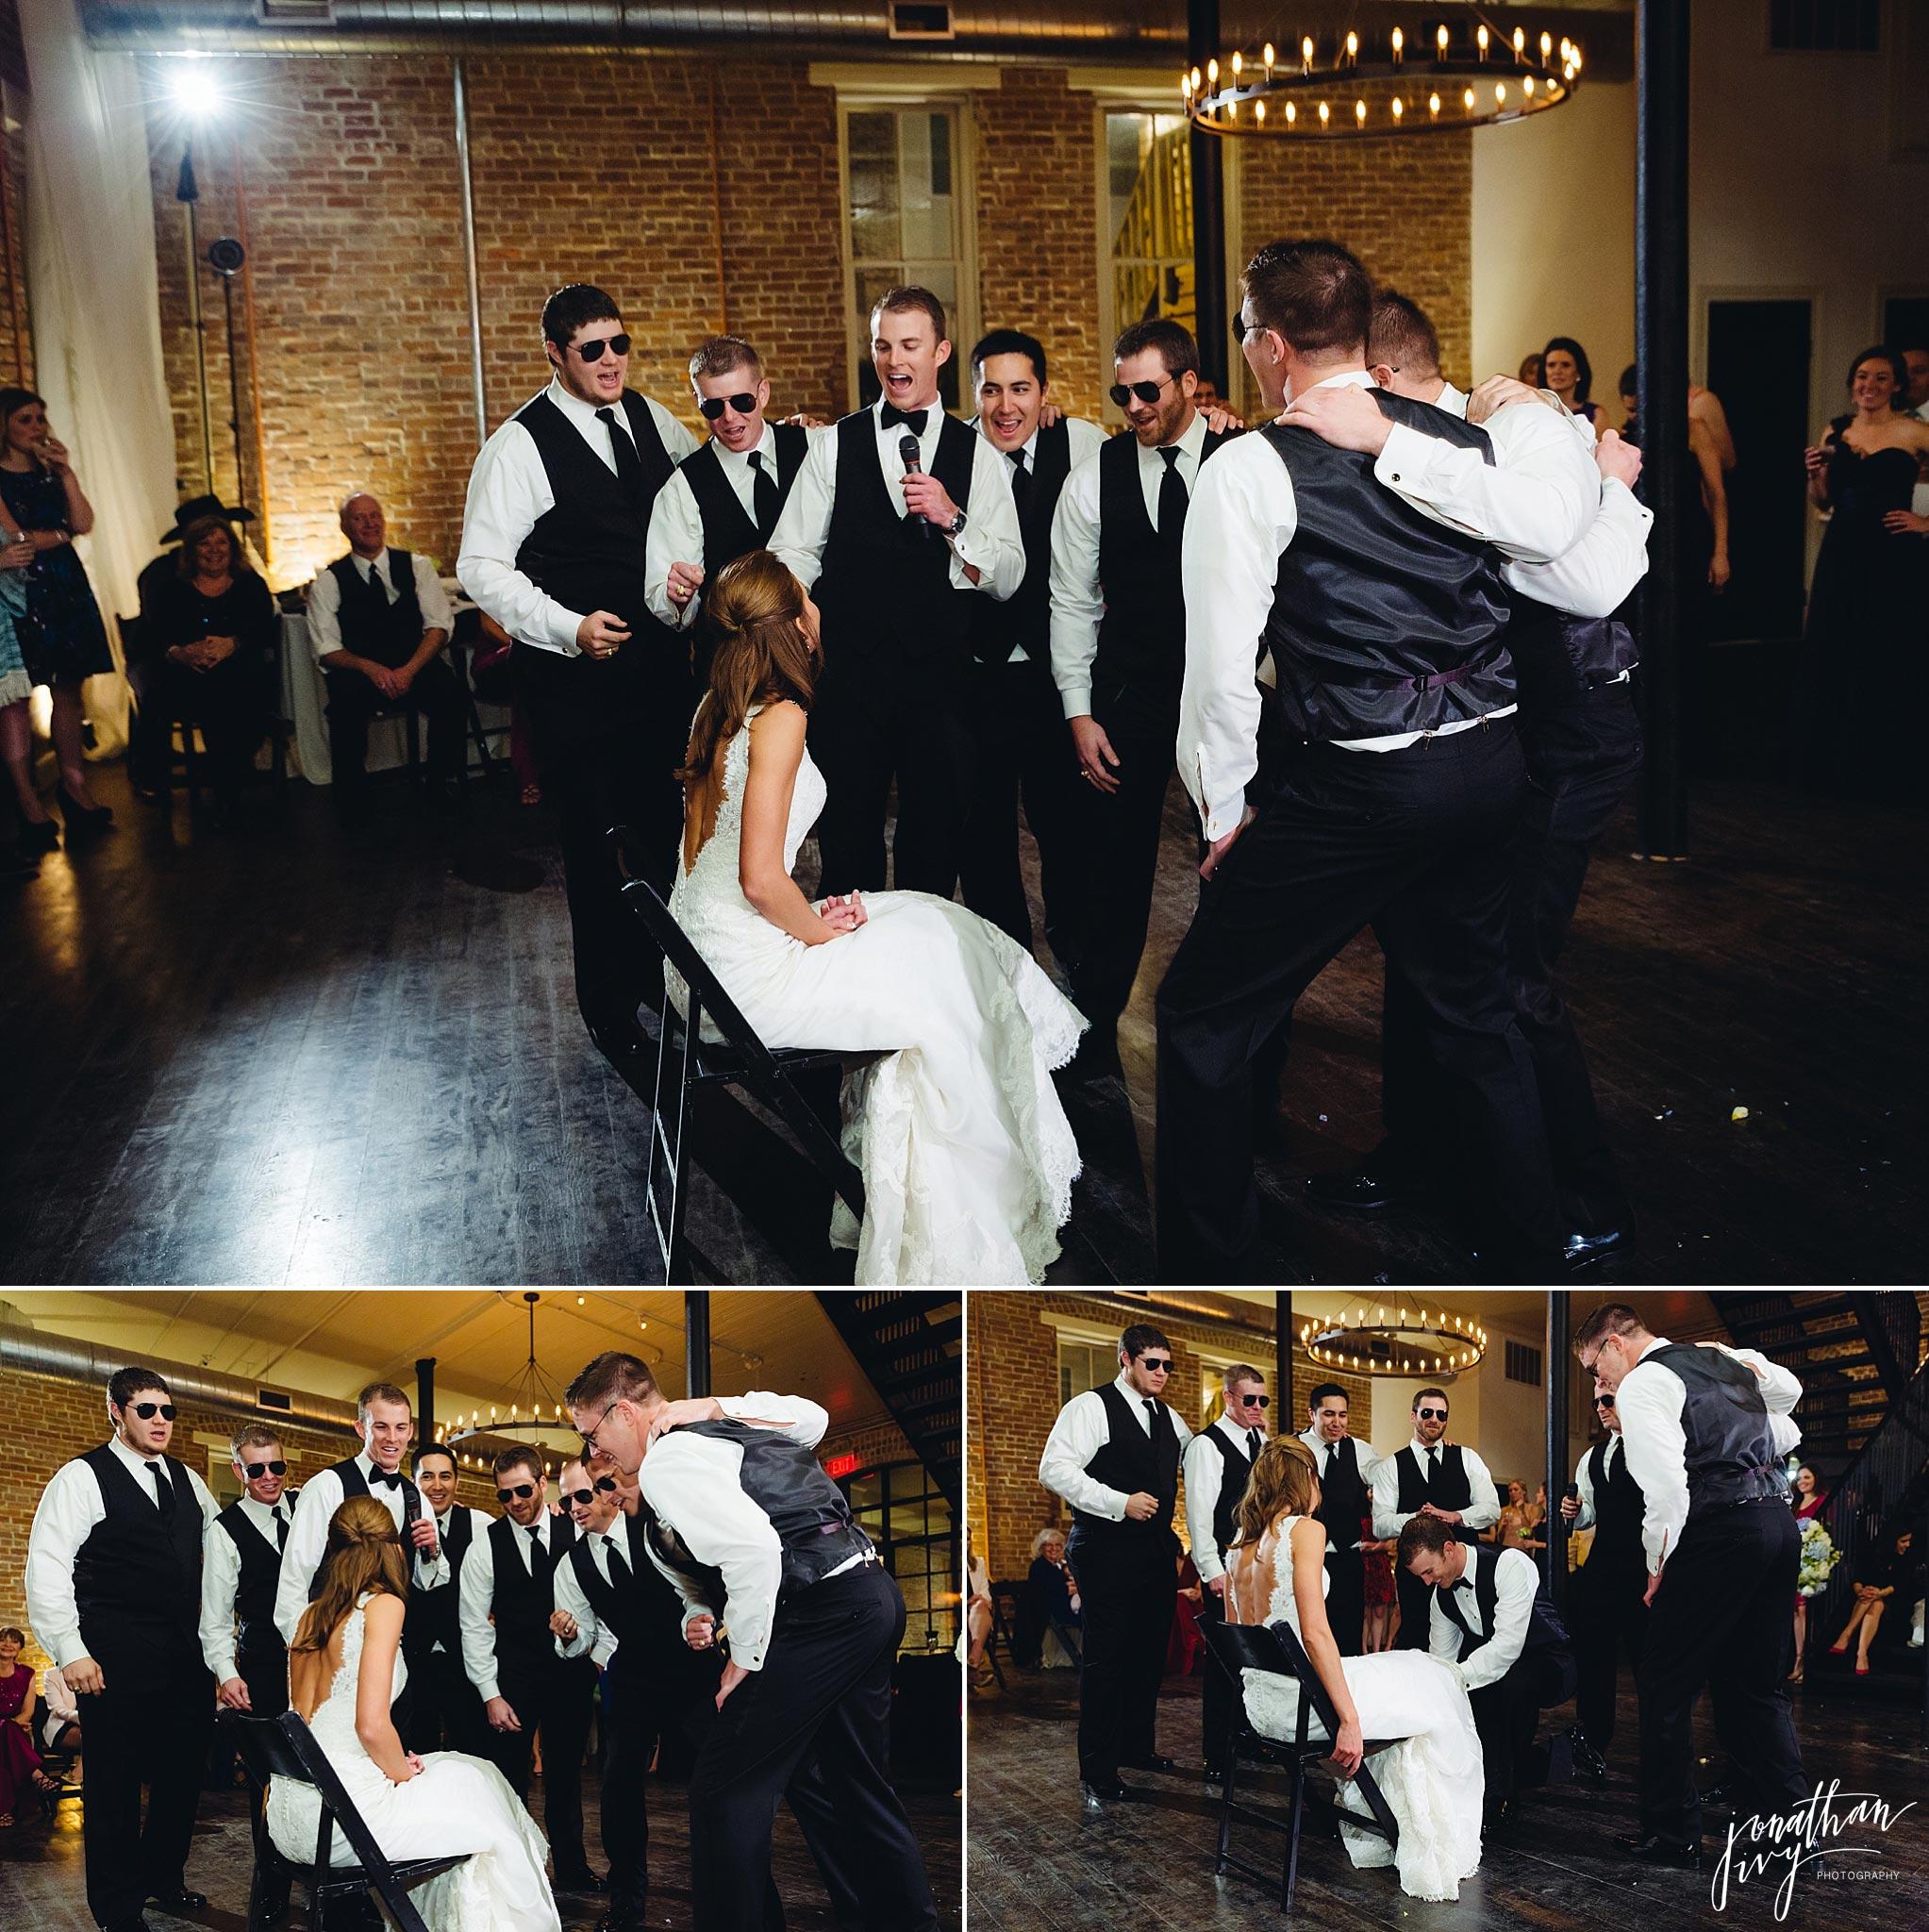 Groomsmen singing to bride at reception